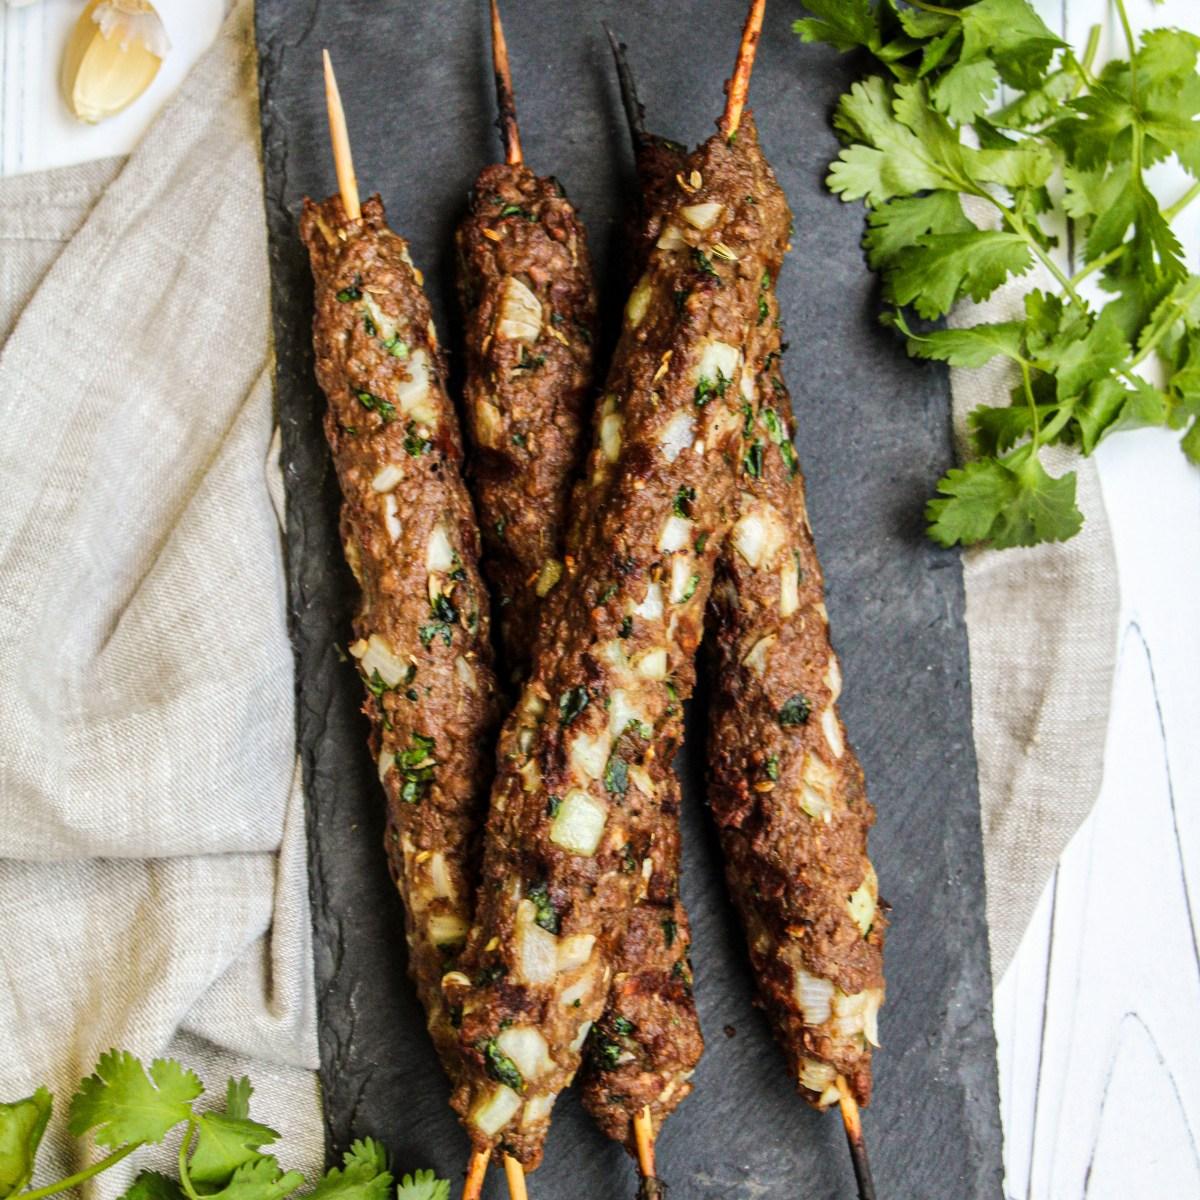 Vegan Turkish kofte kebabs